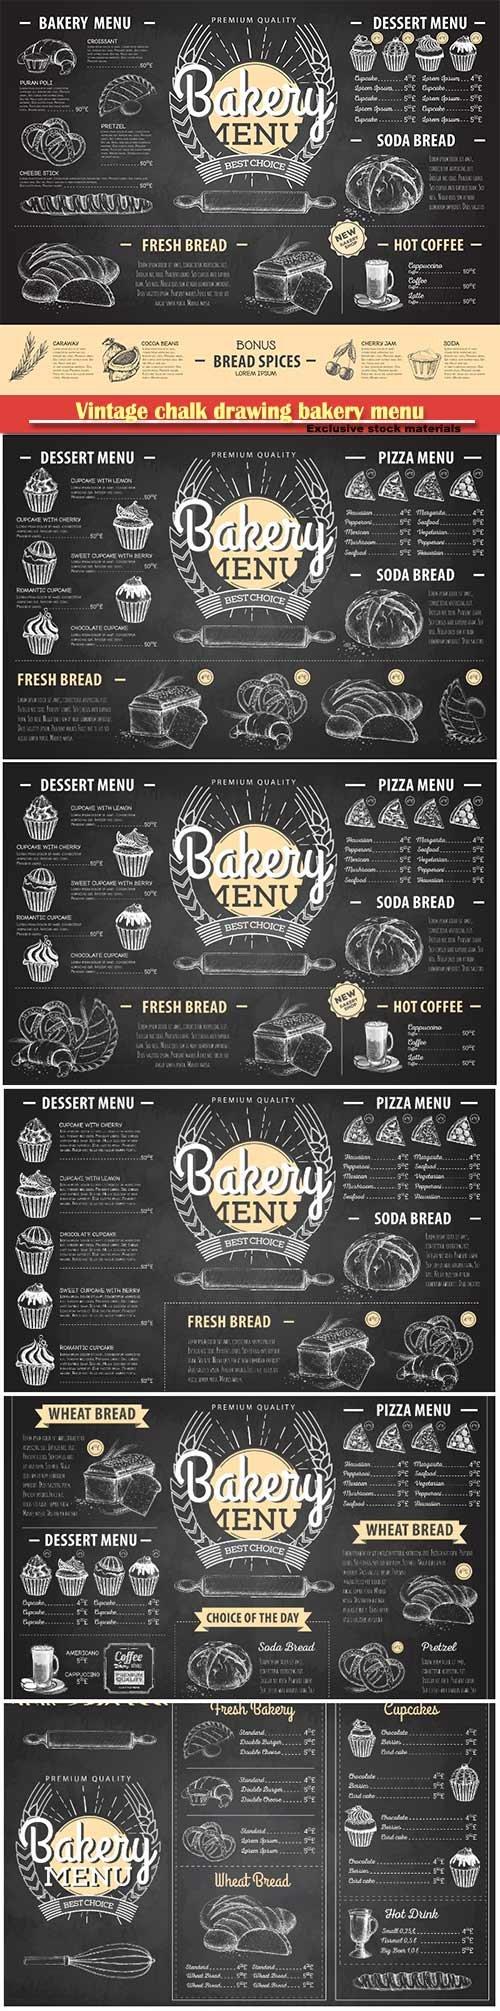 Vintage chalk drawing bakery menu vector design